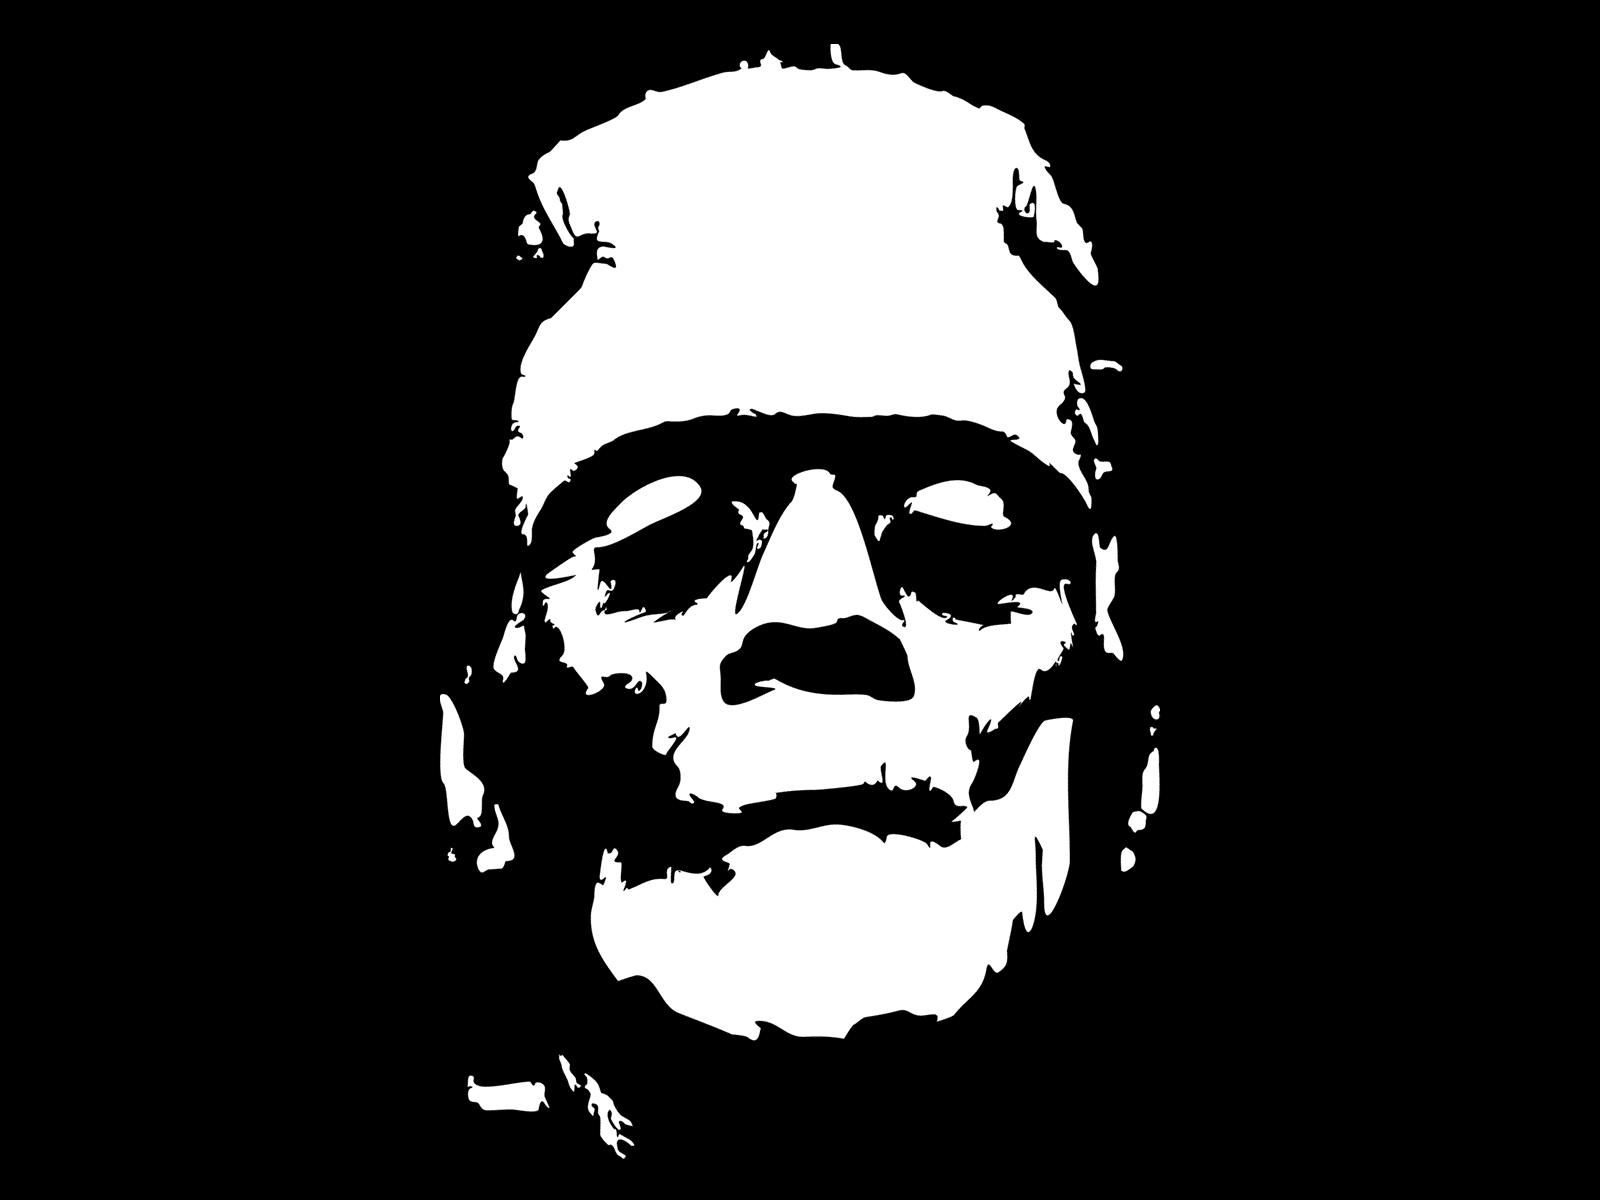 The Monster Redbubble TShirt Design - The Monster – T-shirt design The Monster Redbubble TShirt Design - Portfolio – Print on demand